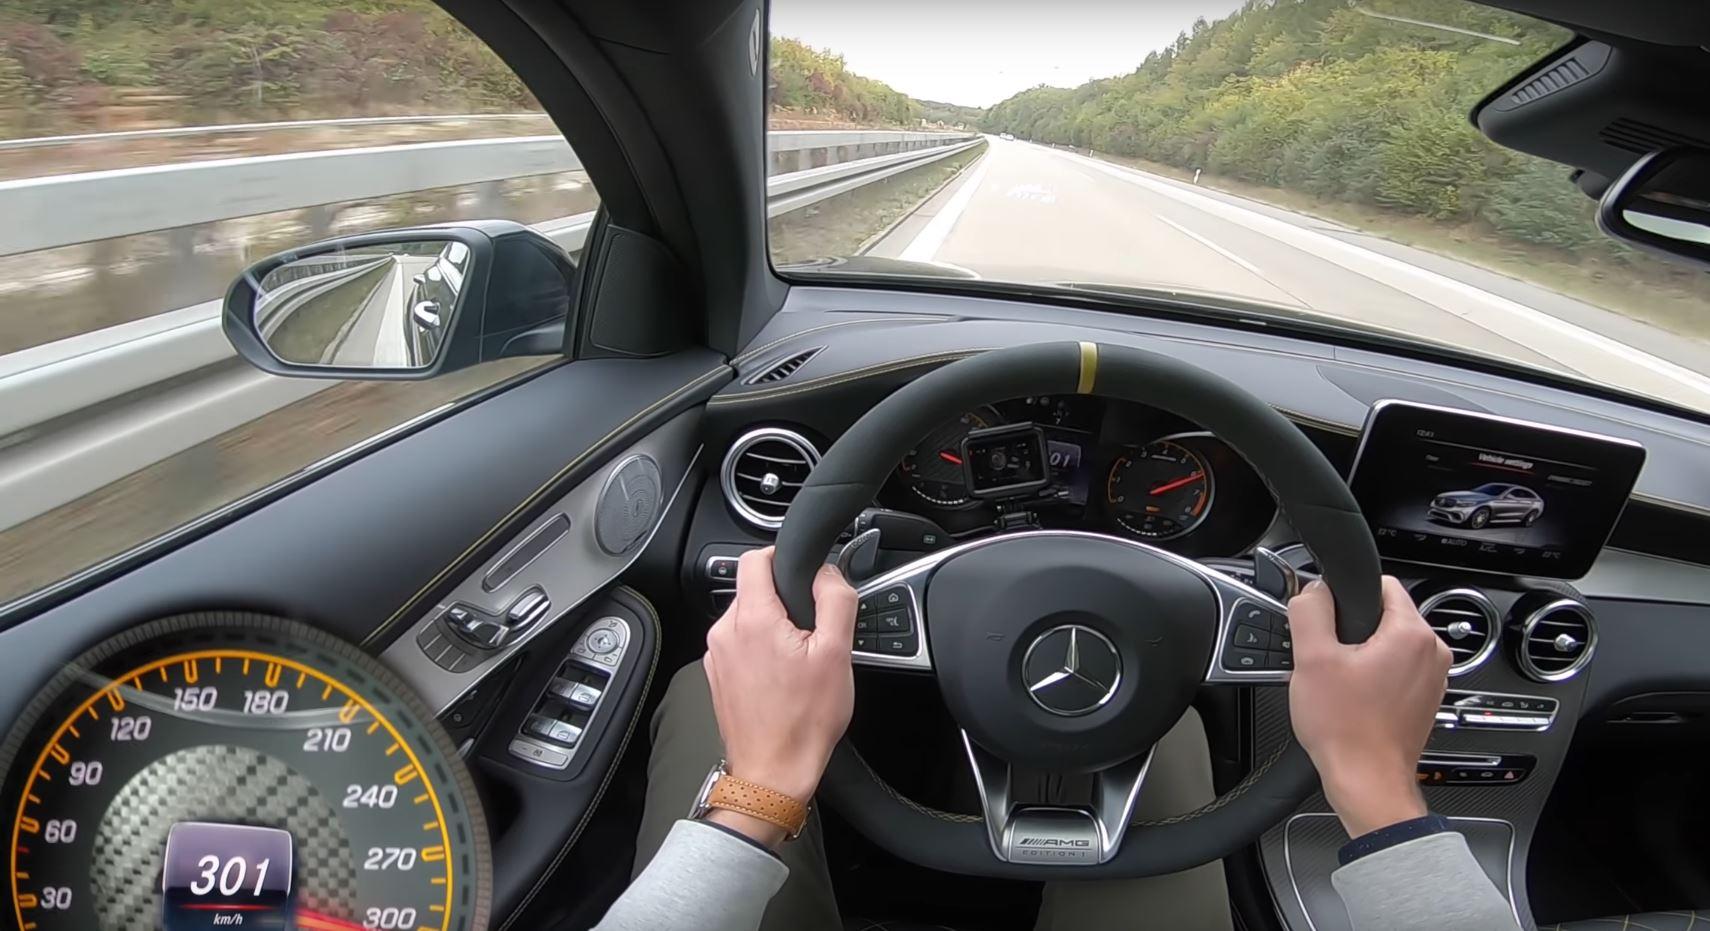 Mercedes-AMG GLC 63 S Coupé - Superšportové parametre bez zmeny výzoru - prekvapenie pod kapotou!